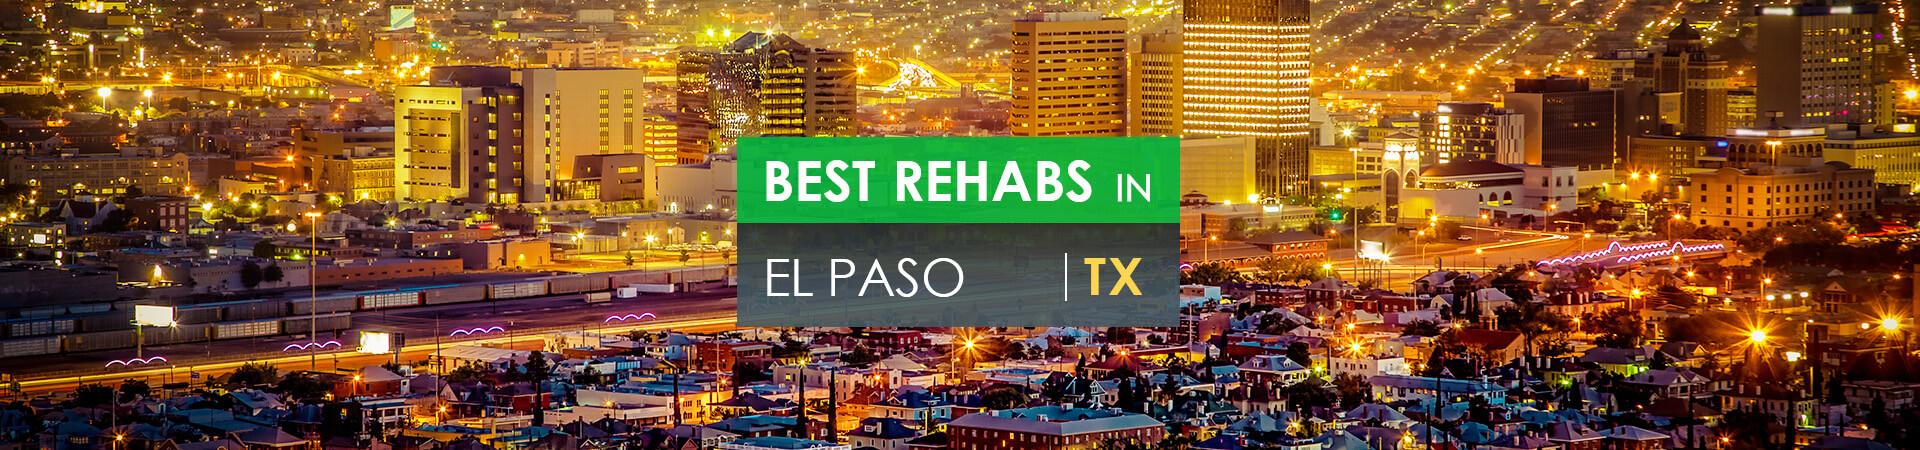 Best rehabs in El Paso, TX